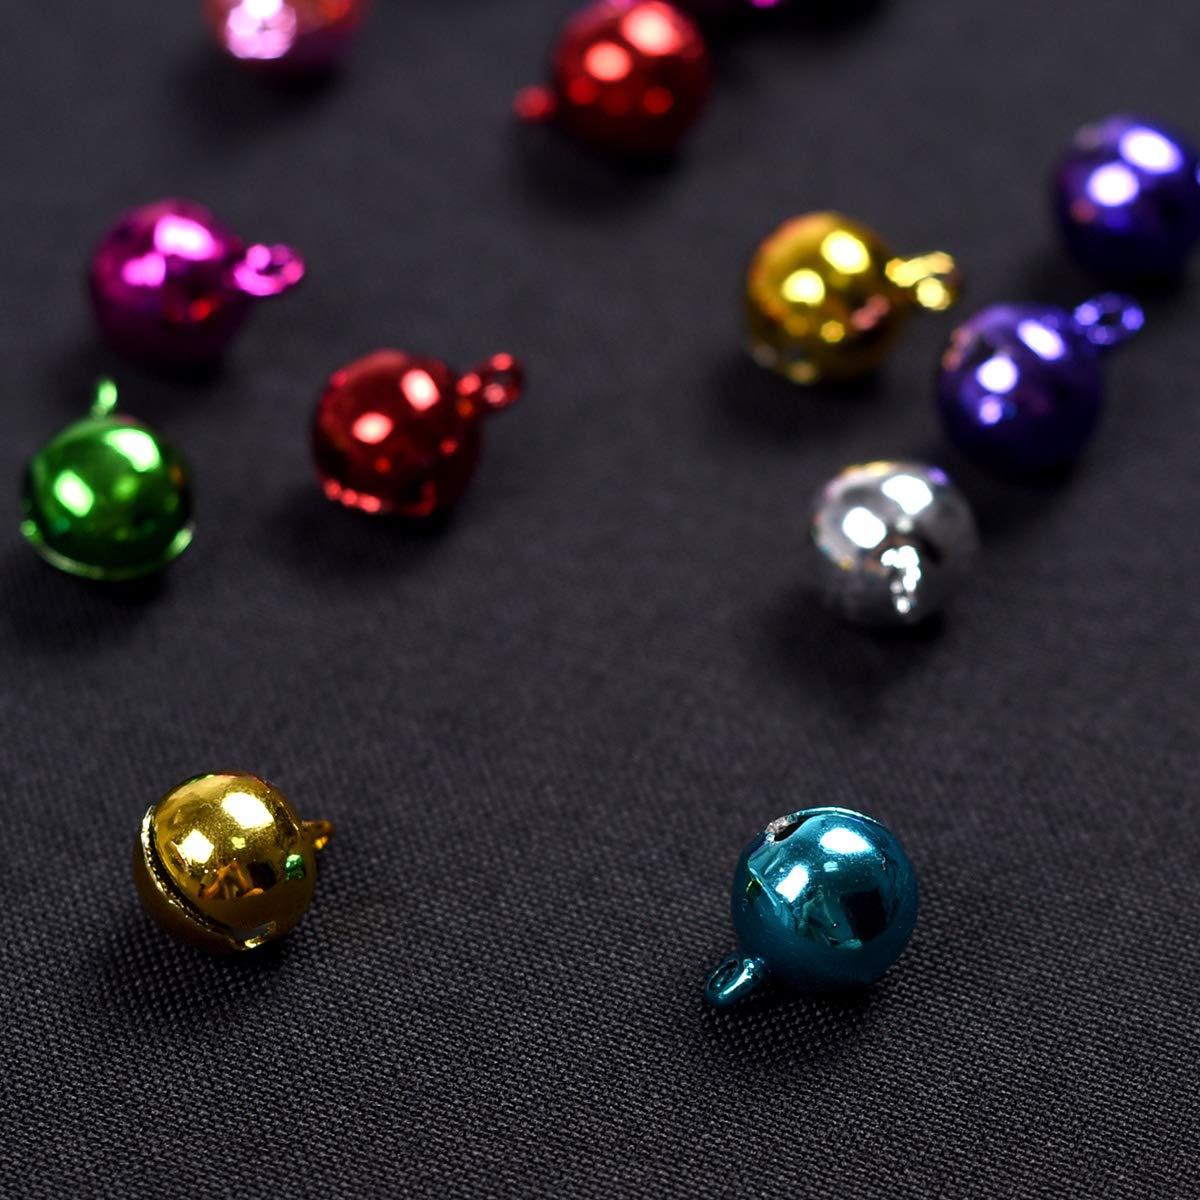 Jingle Bells for Crafts,iKammo 12mm Small Bells DIY Bells Christmas Crafts for DIY Bracelet Anklets Necklace Knitting//Jewelry Making Gold,100pcs